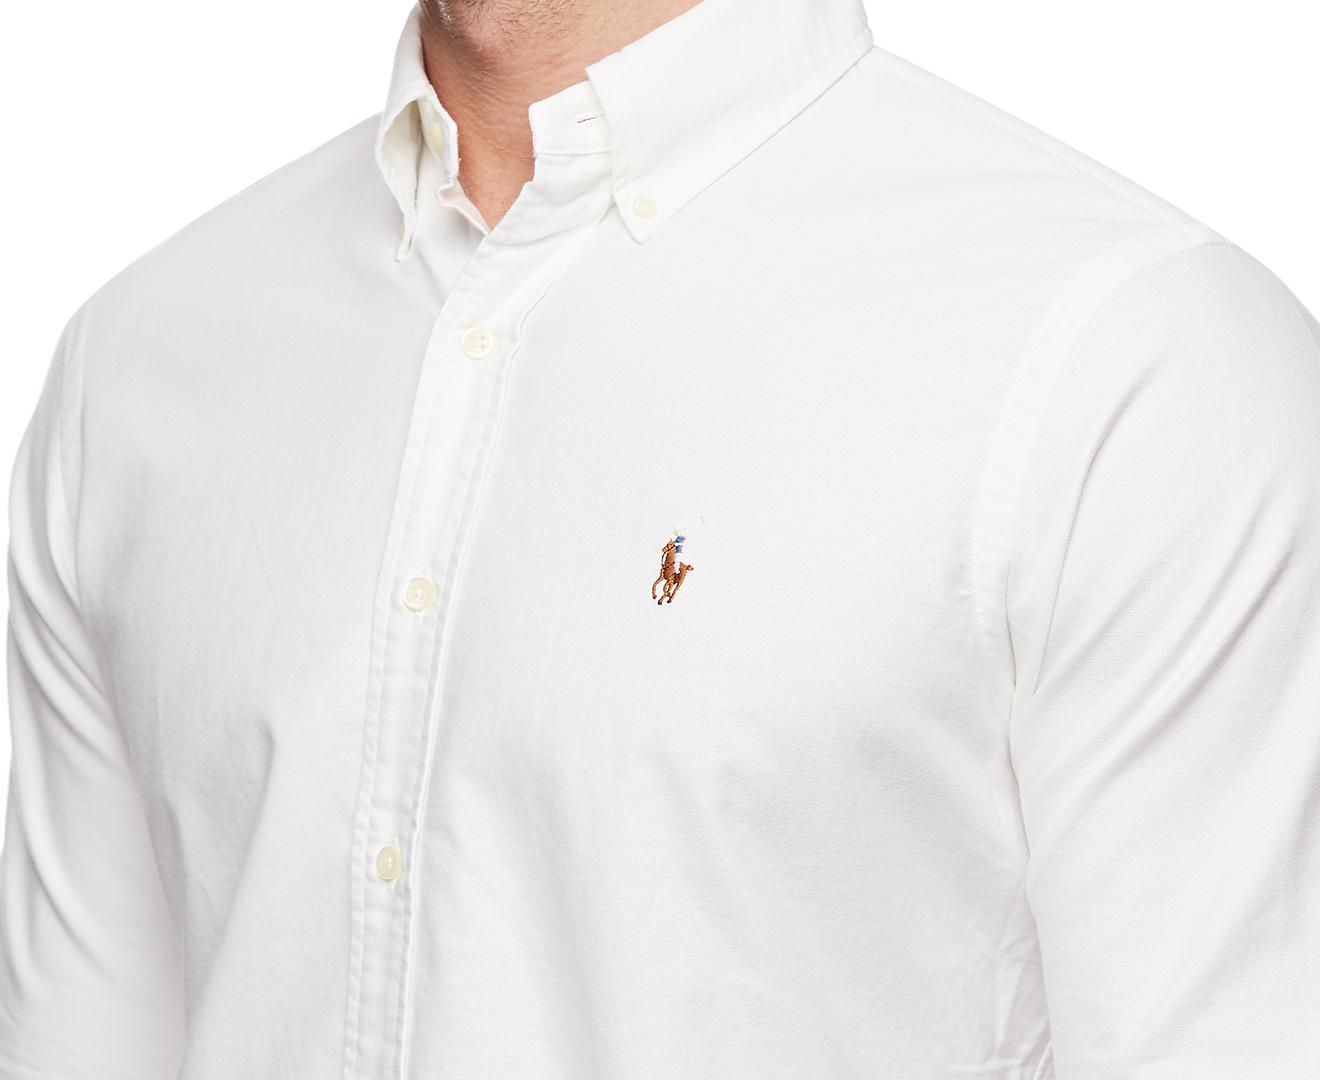 Oxford Ralph Men's Lauren White Shirt Polo T1clFJK